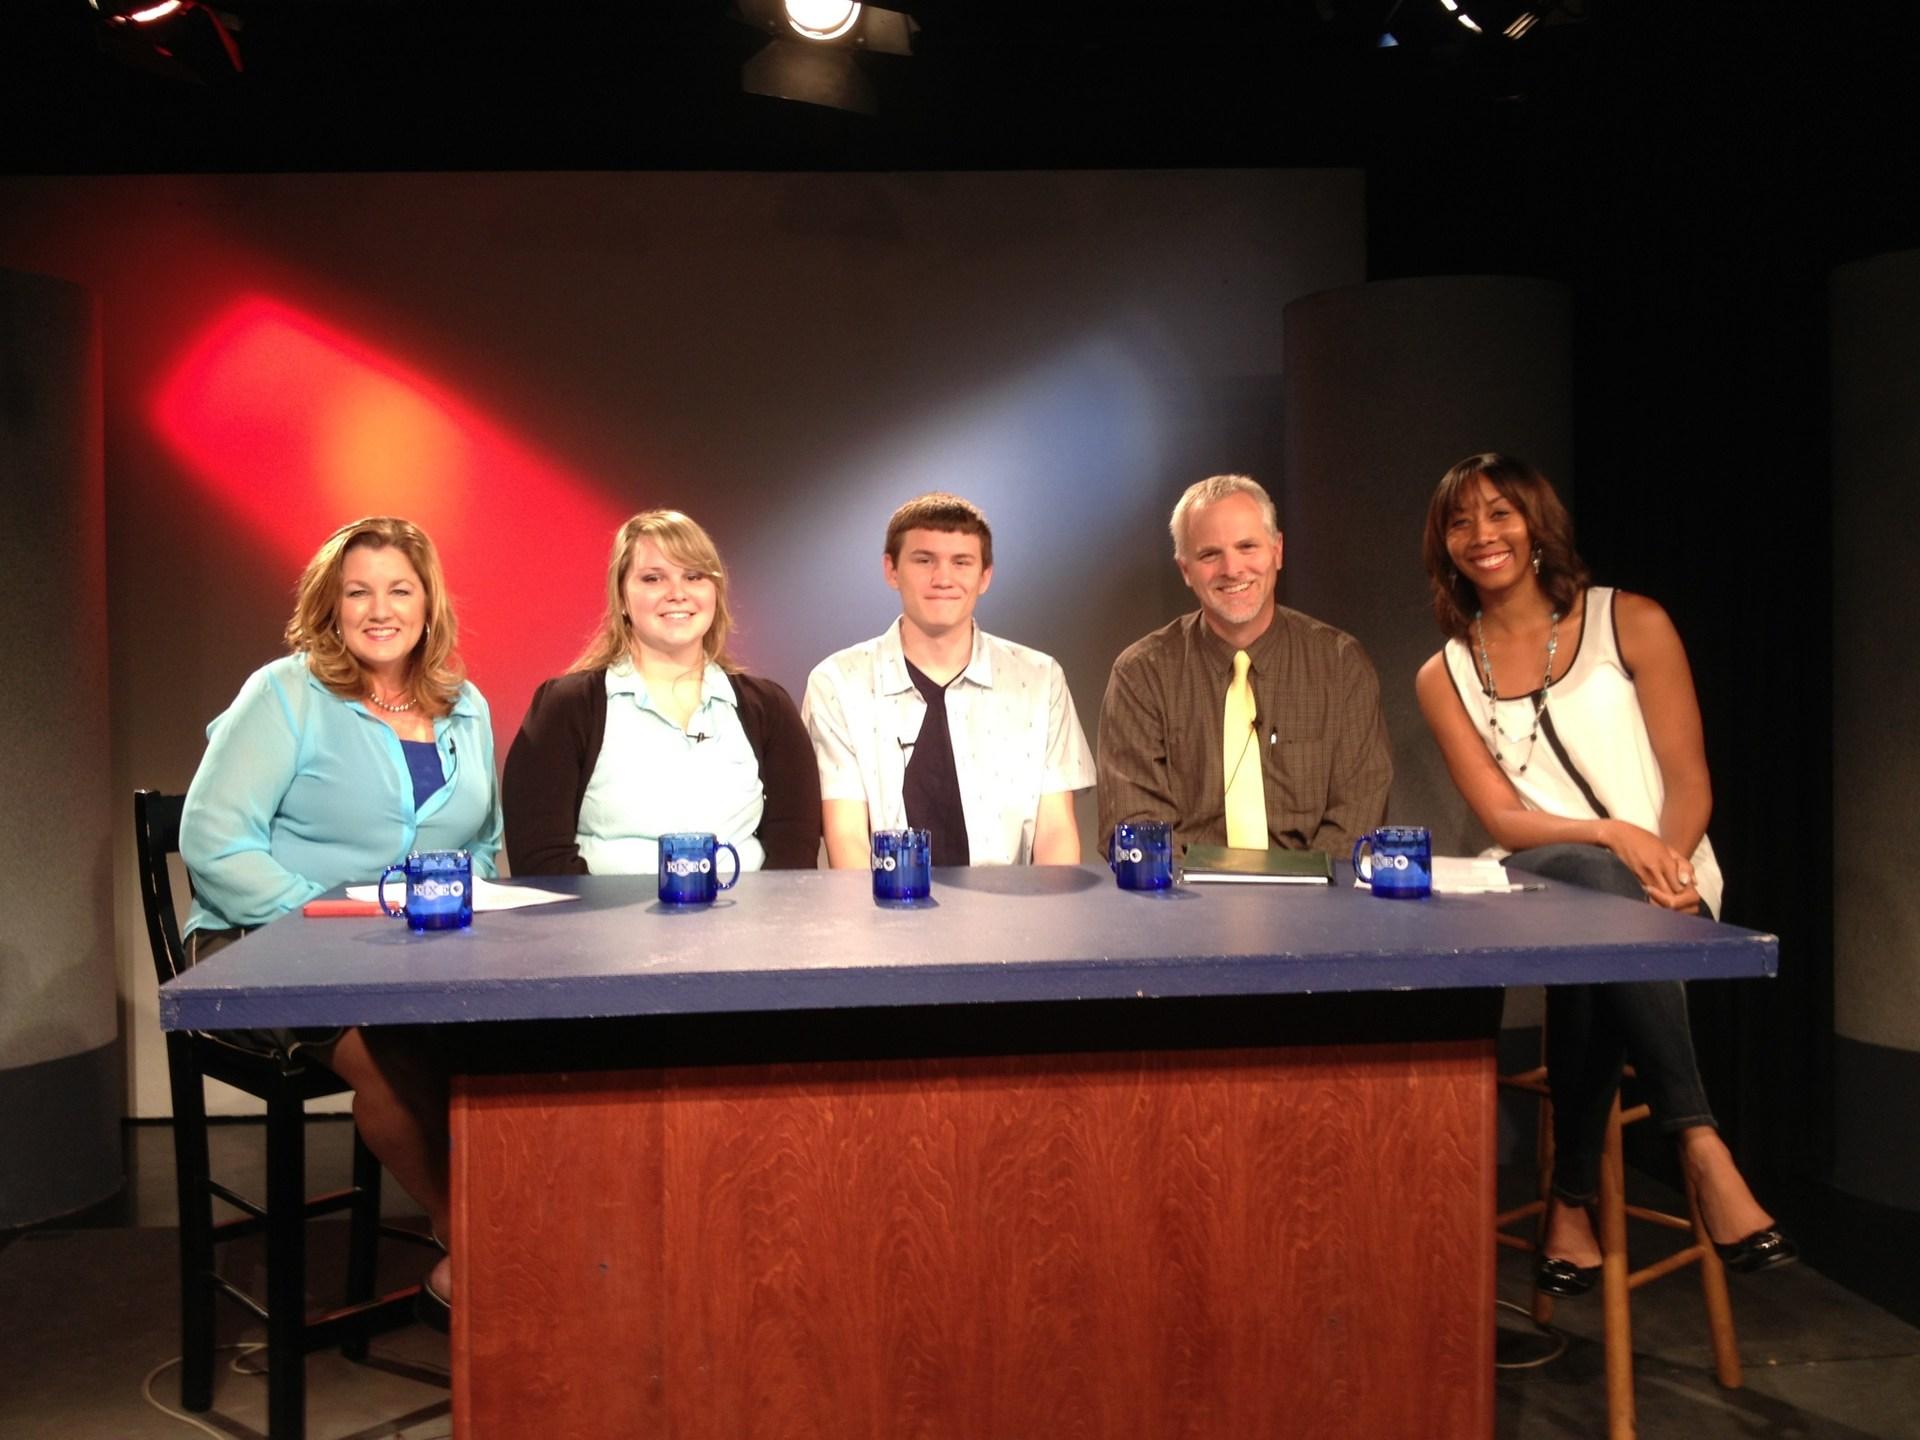 Interviewed on KIXE TV, Channnel 9